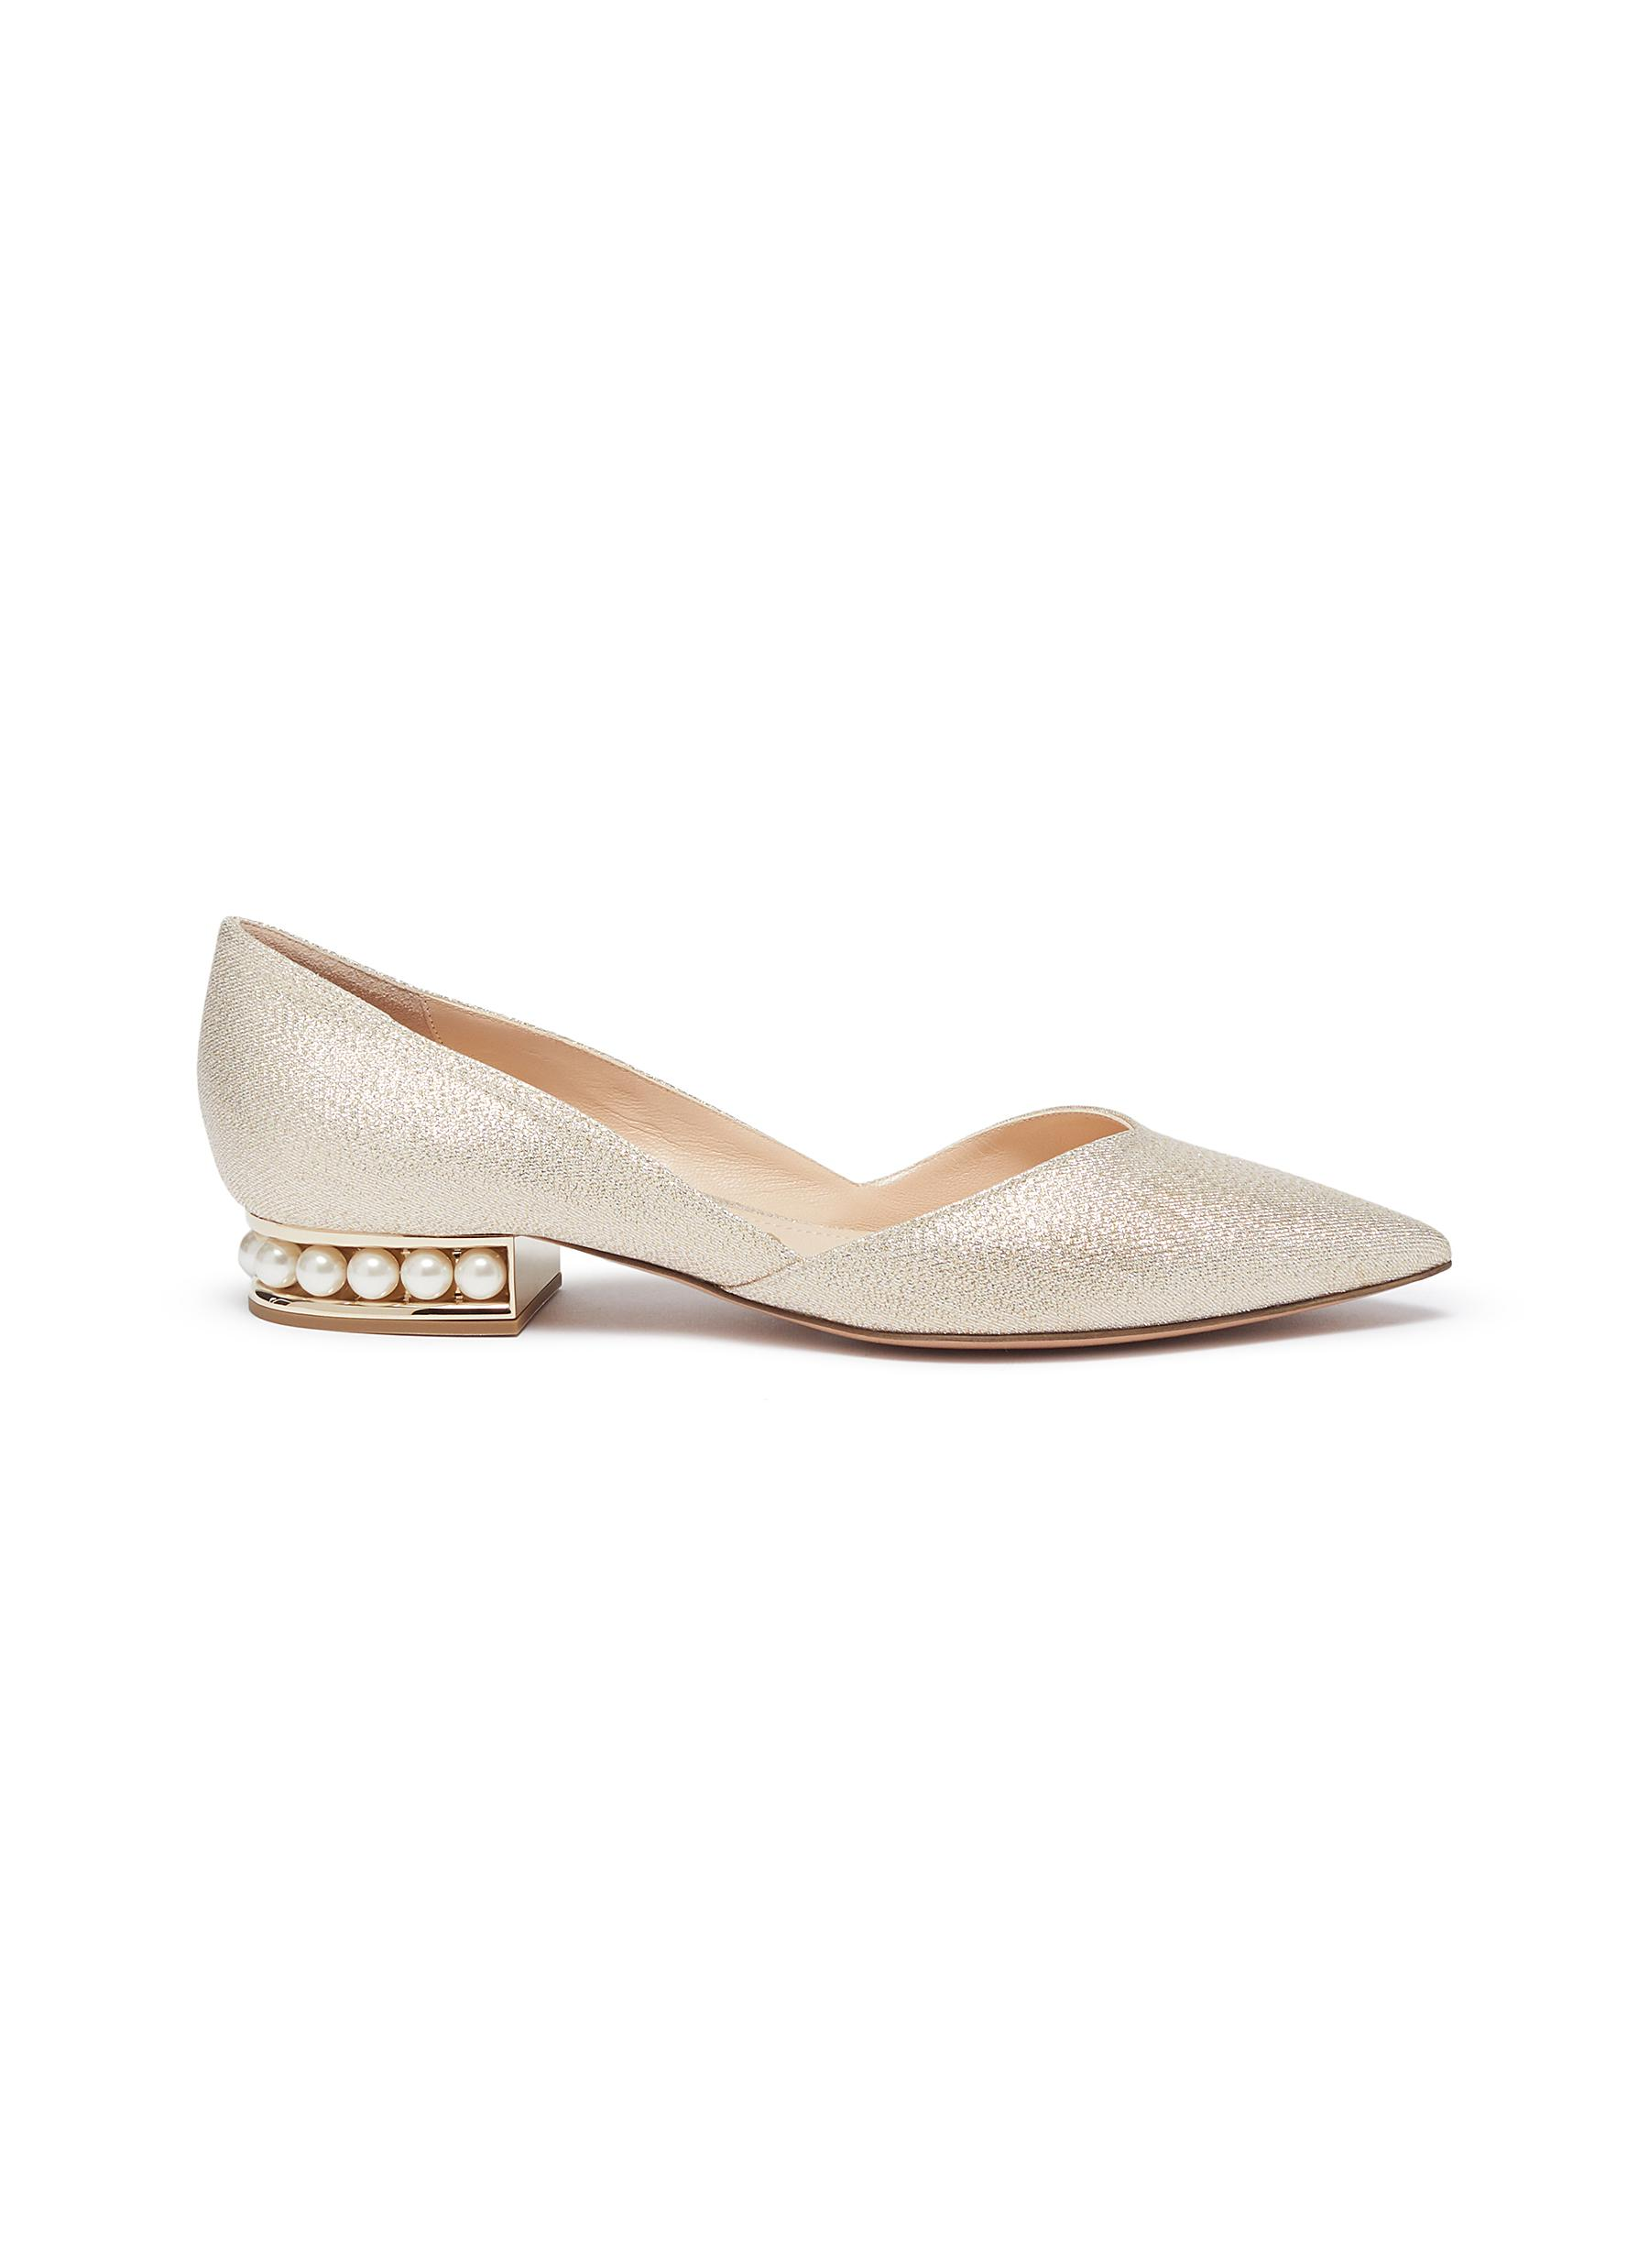 Nicholas Kirkwood Flats Casati Lurex faux pearl heel metallic leather DOrsay flats